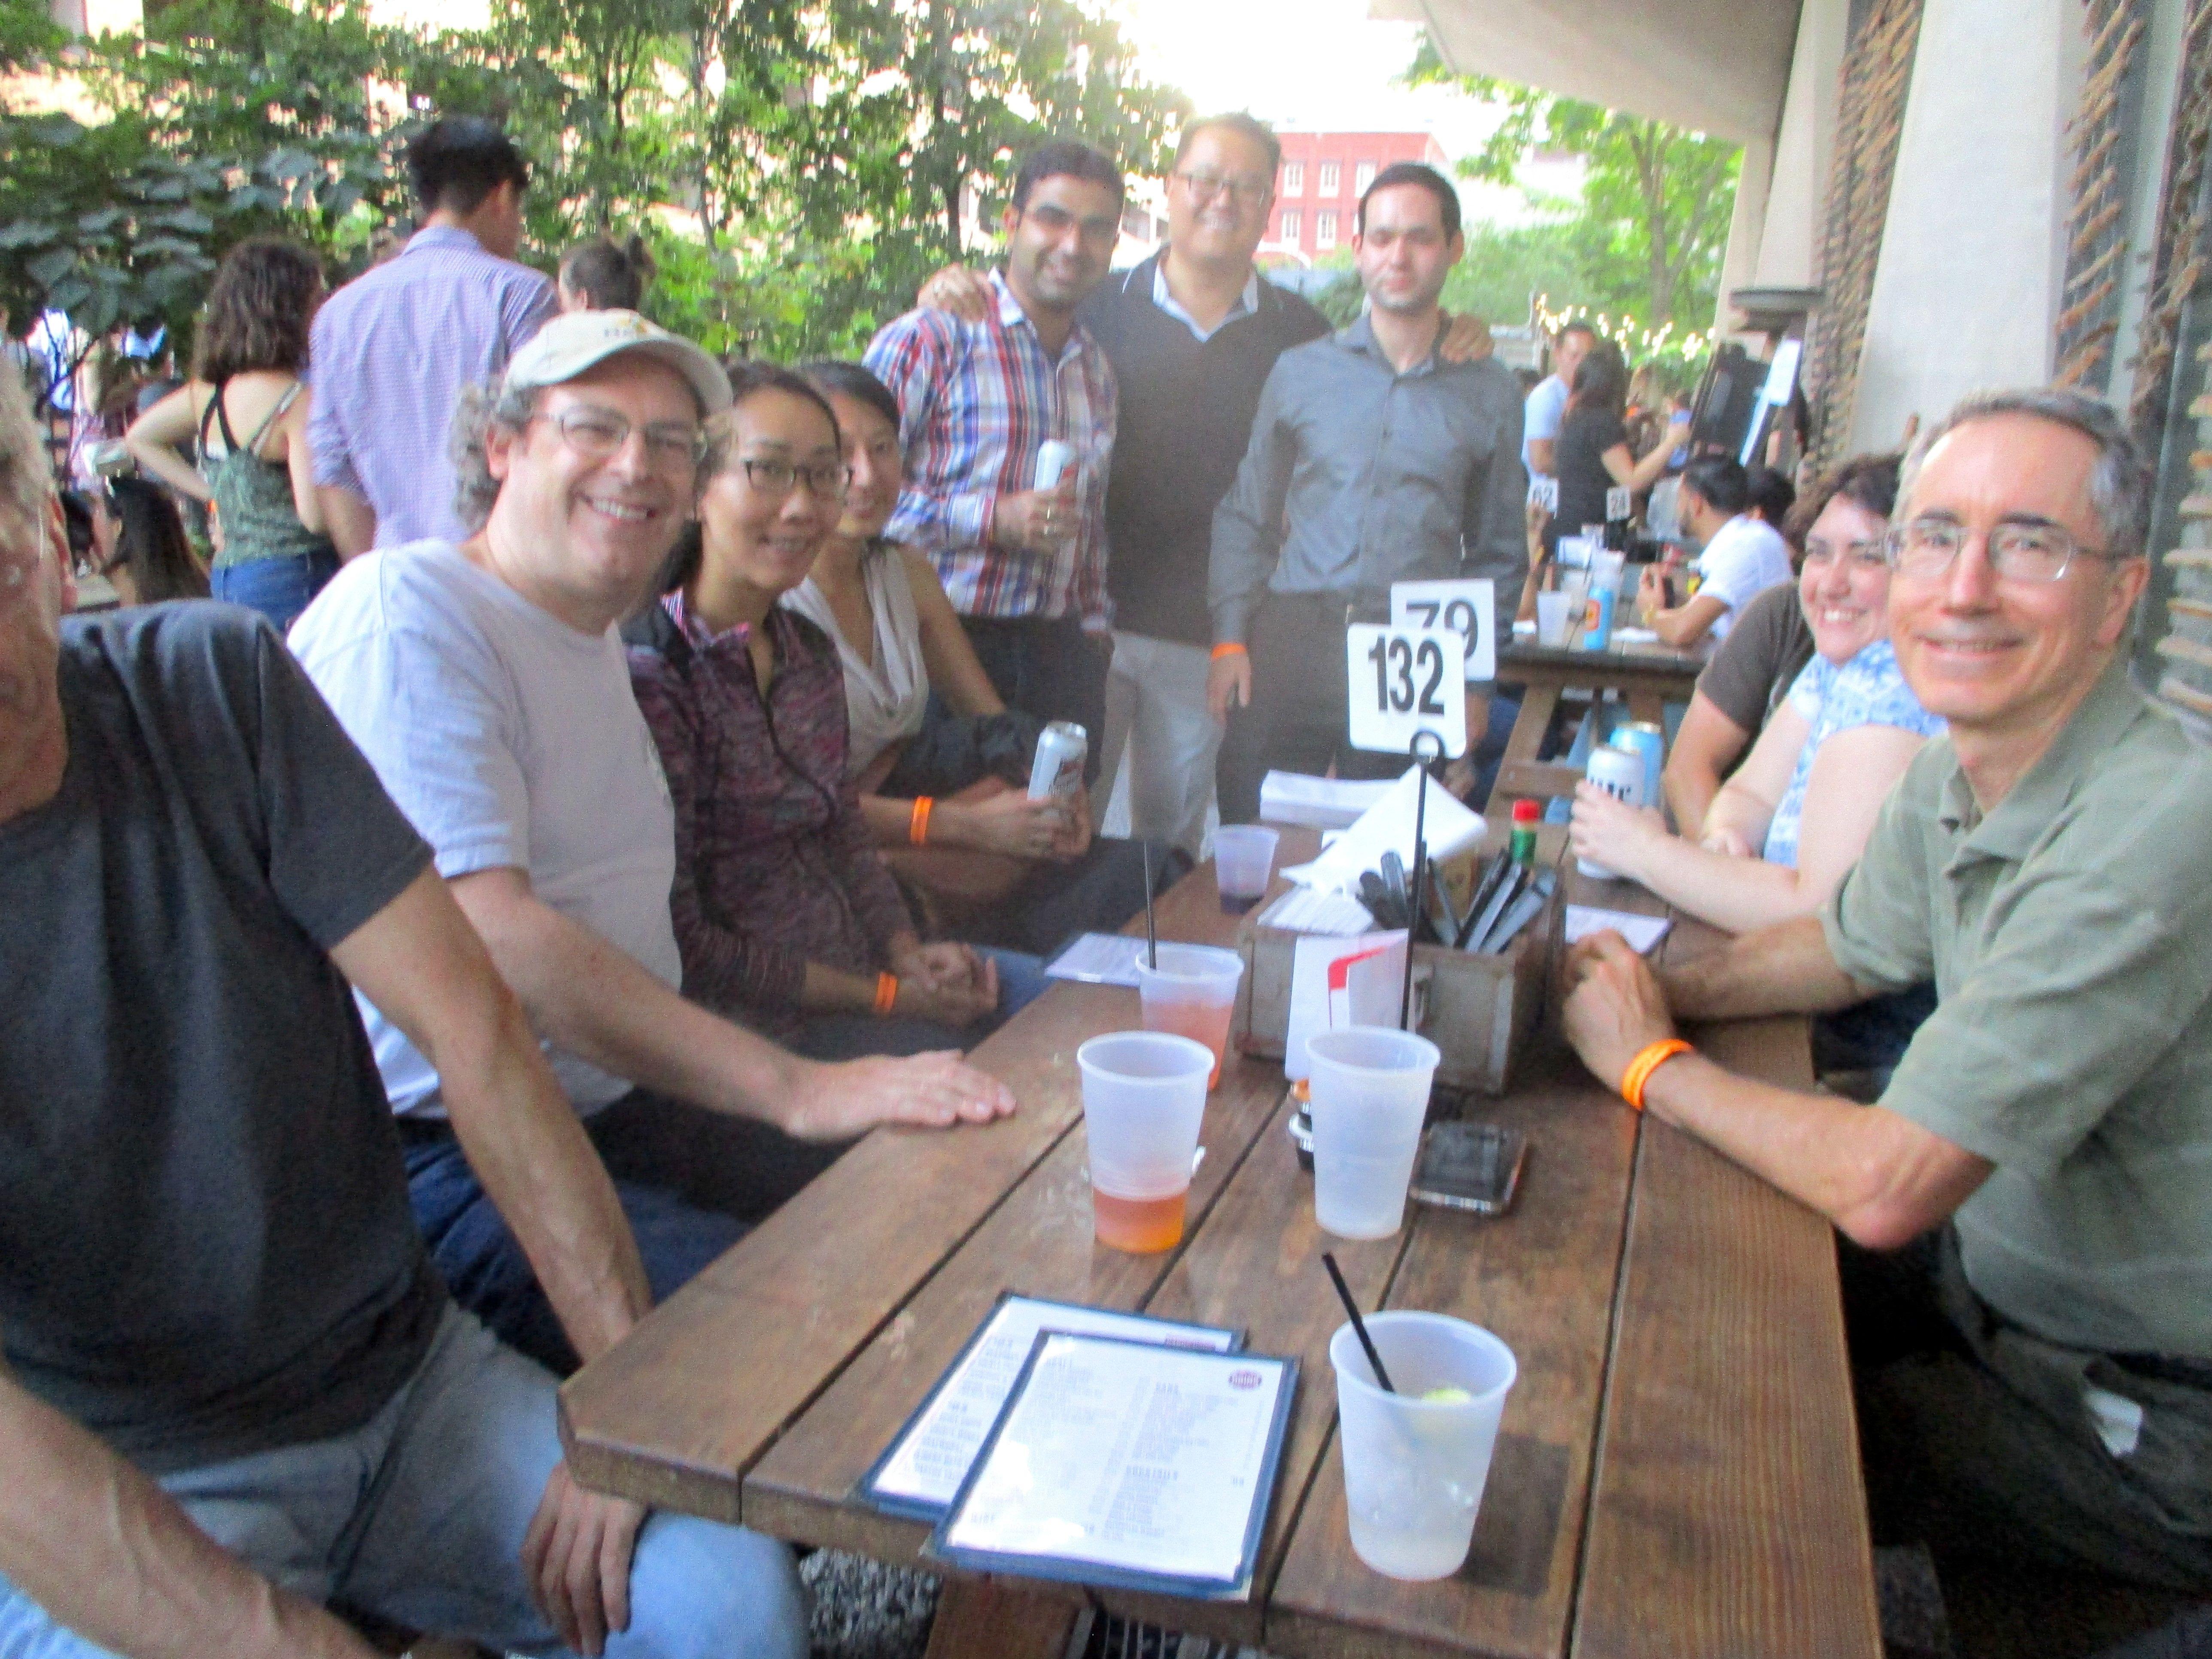 The Philadelphia Happy Hour Meetup Group